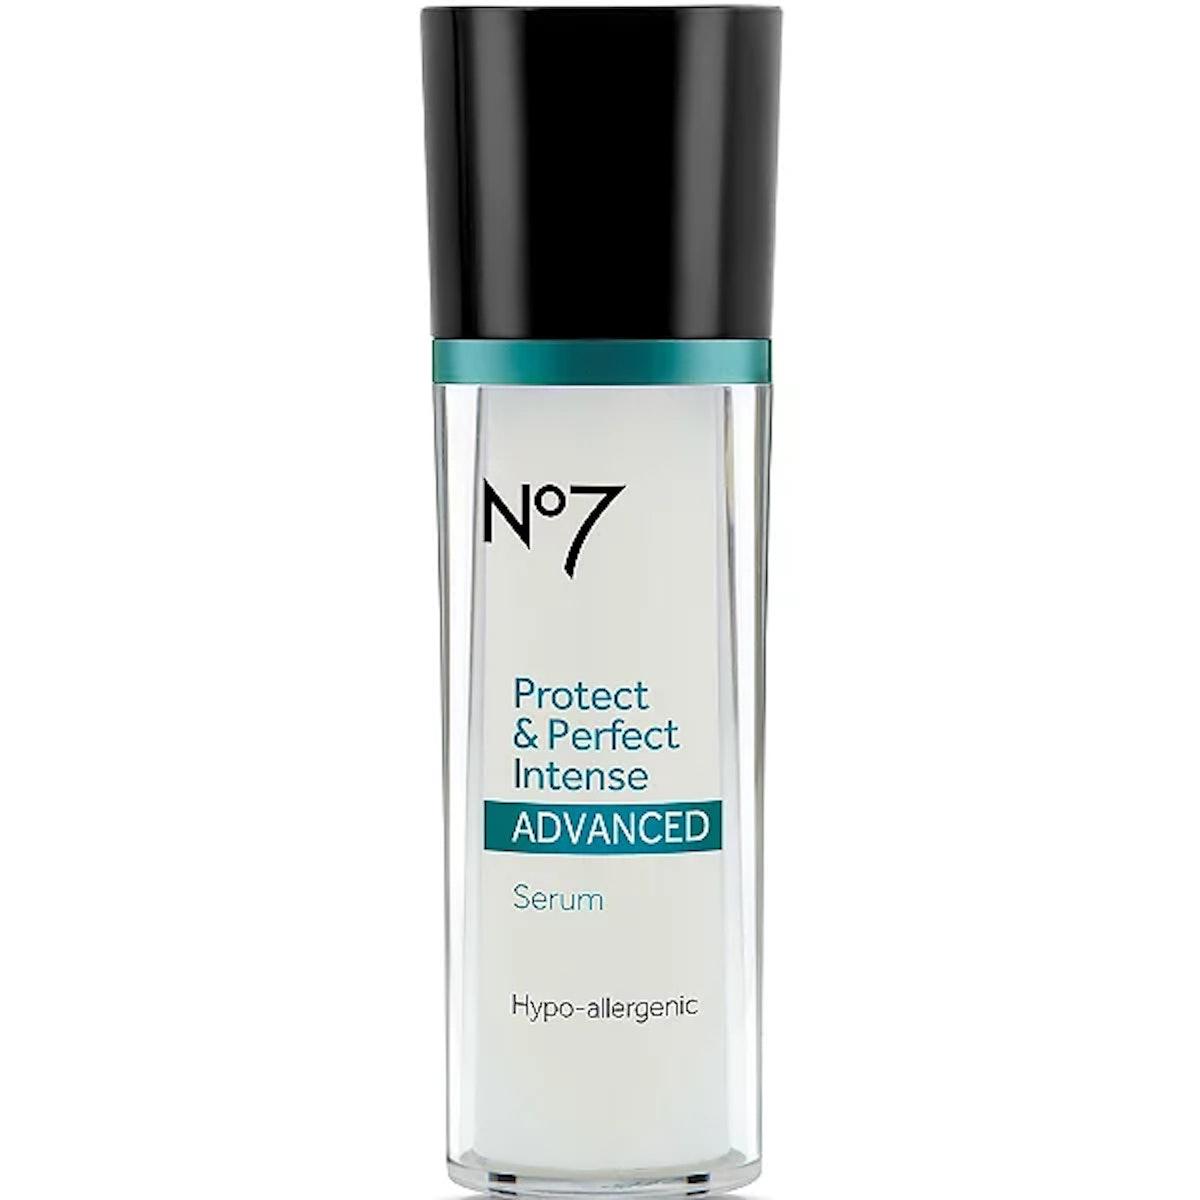 Protect & Perfect Intense Advanced Serum